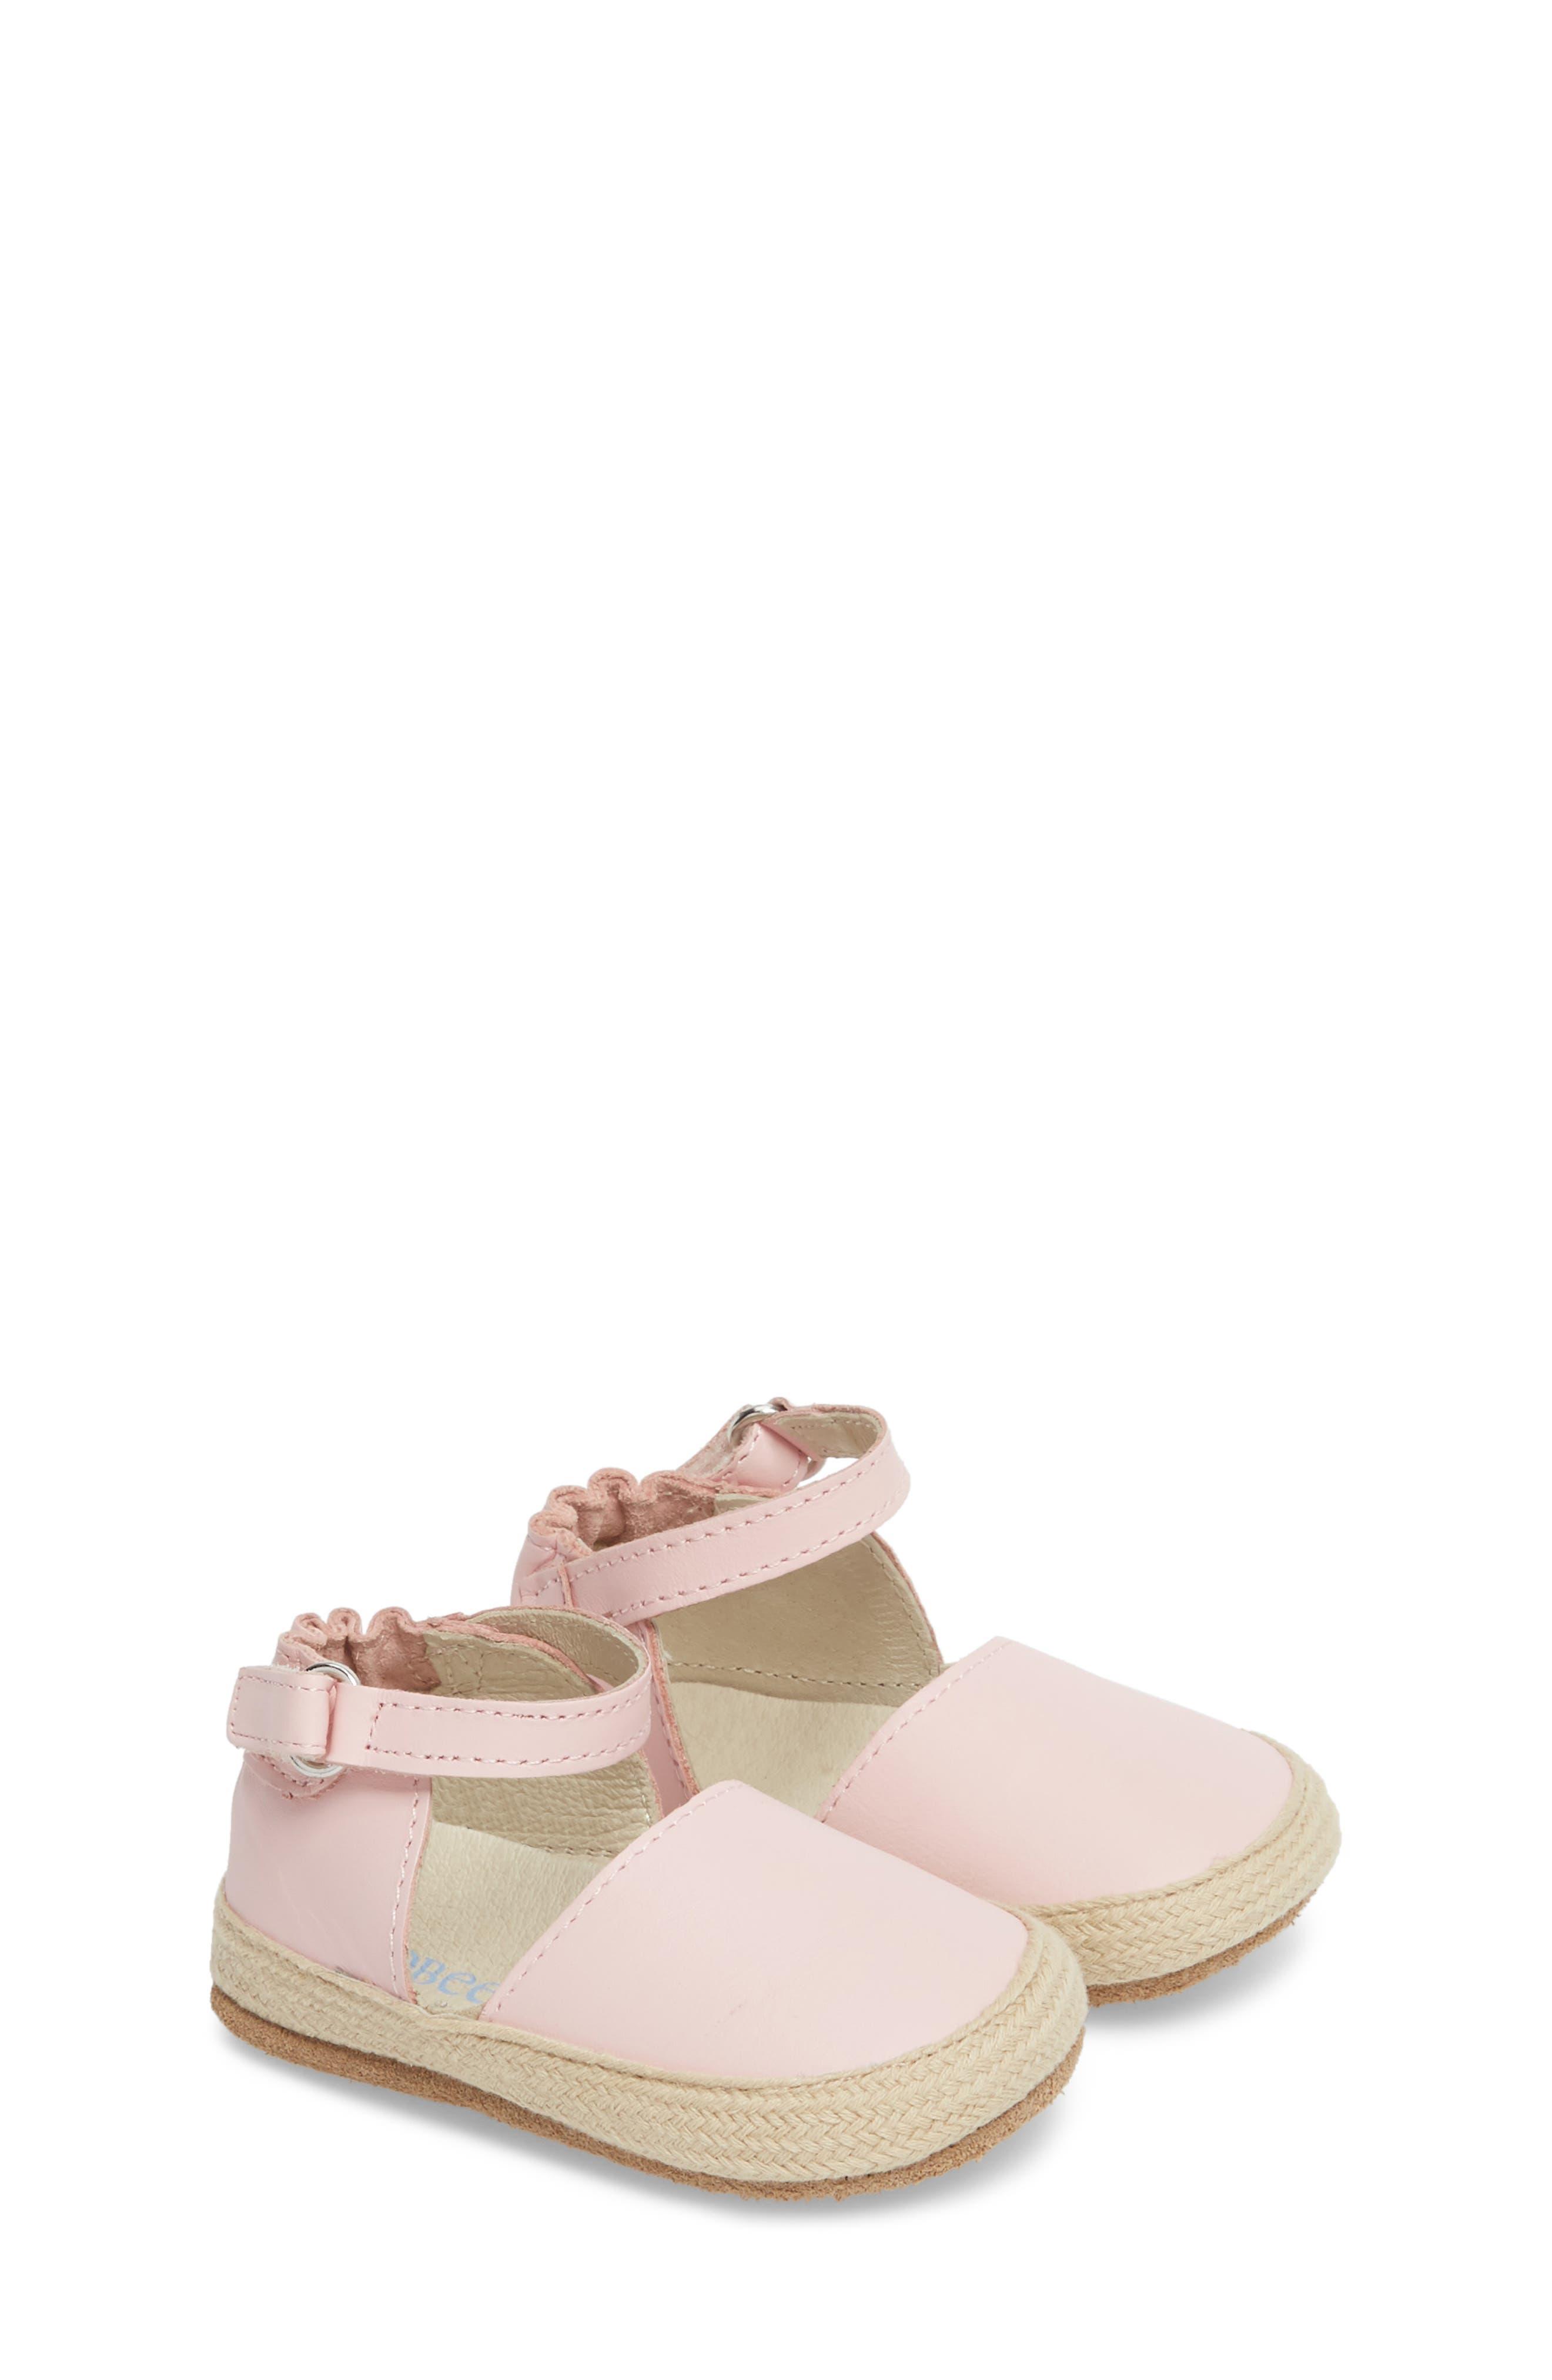 Kelly Soft Sole Espadrille Sandal,                         Main,                         color, 680